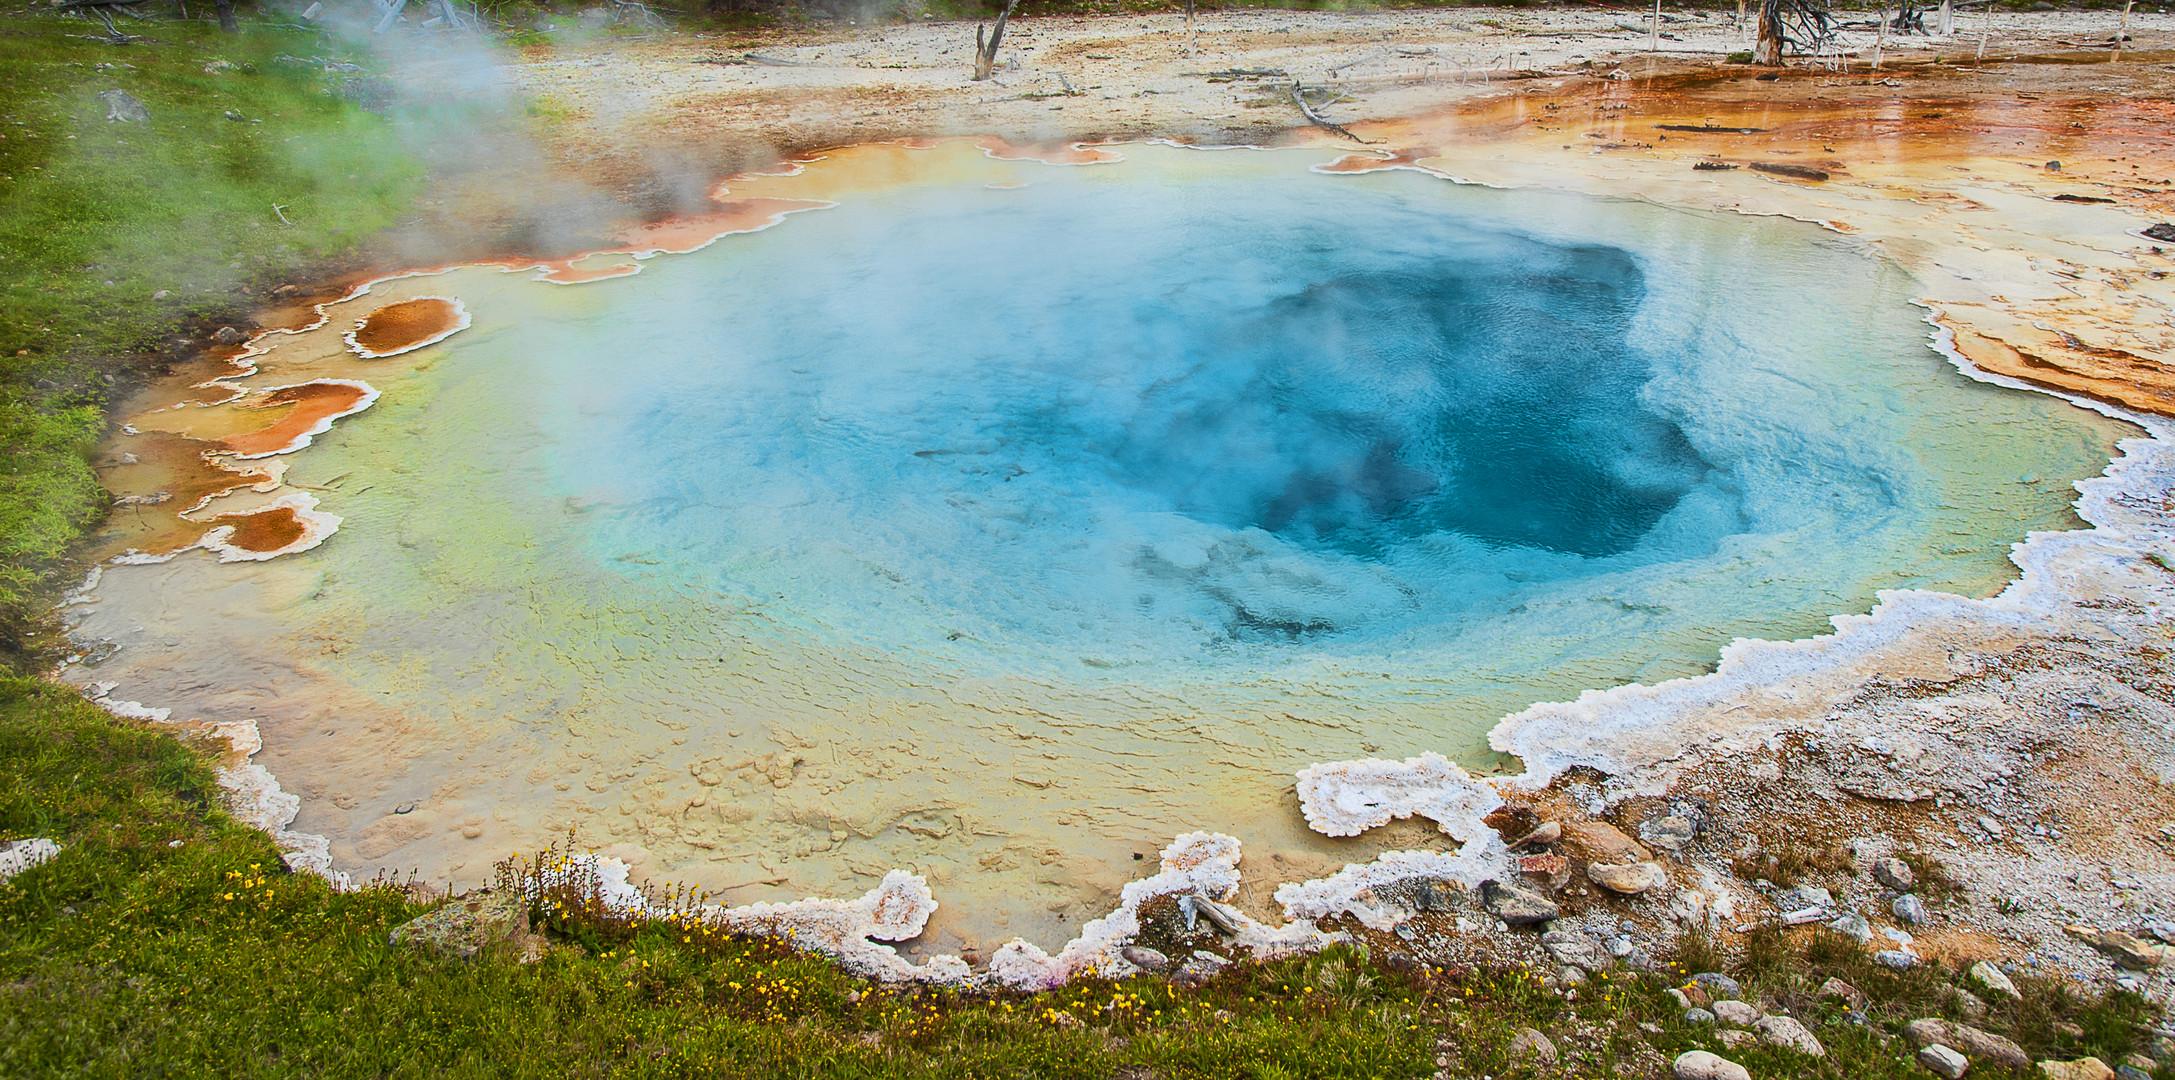 Geothermal Hot Spring - No Swimming